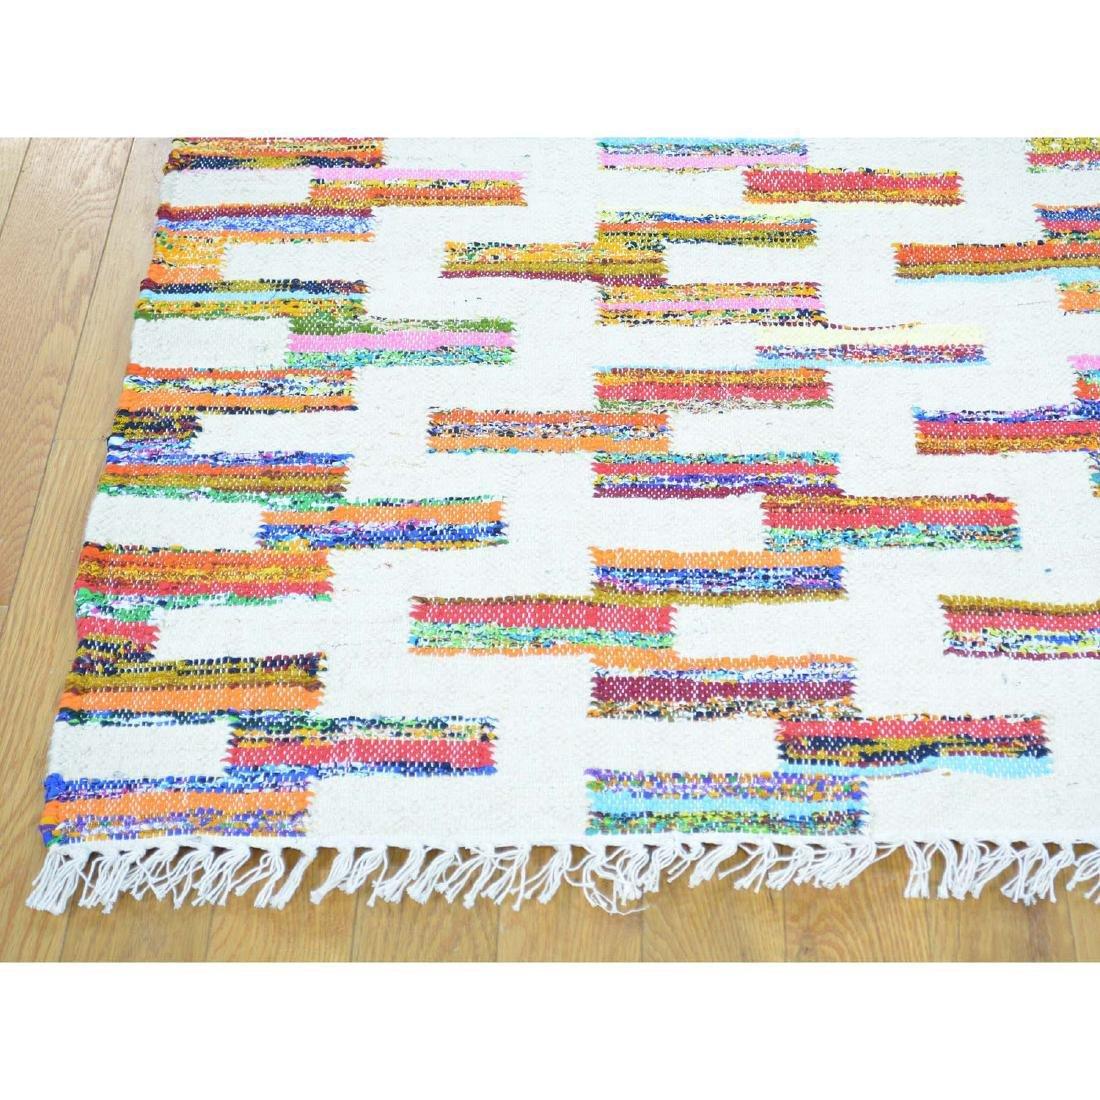 Cotton Sari Silk Flat Weave Kilim Hand Woven Rug 5x7.1 - 3